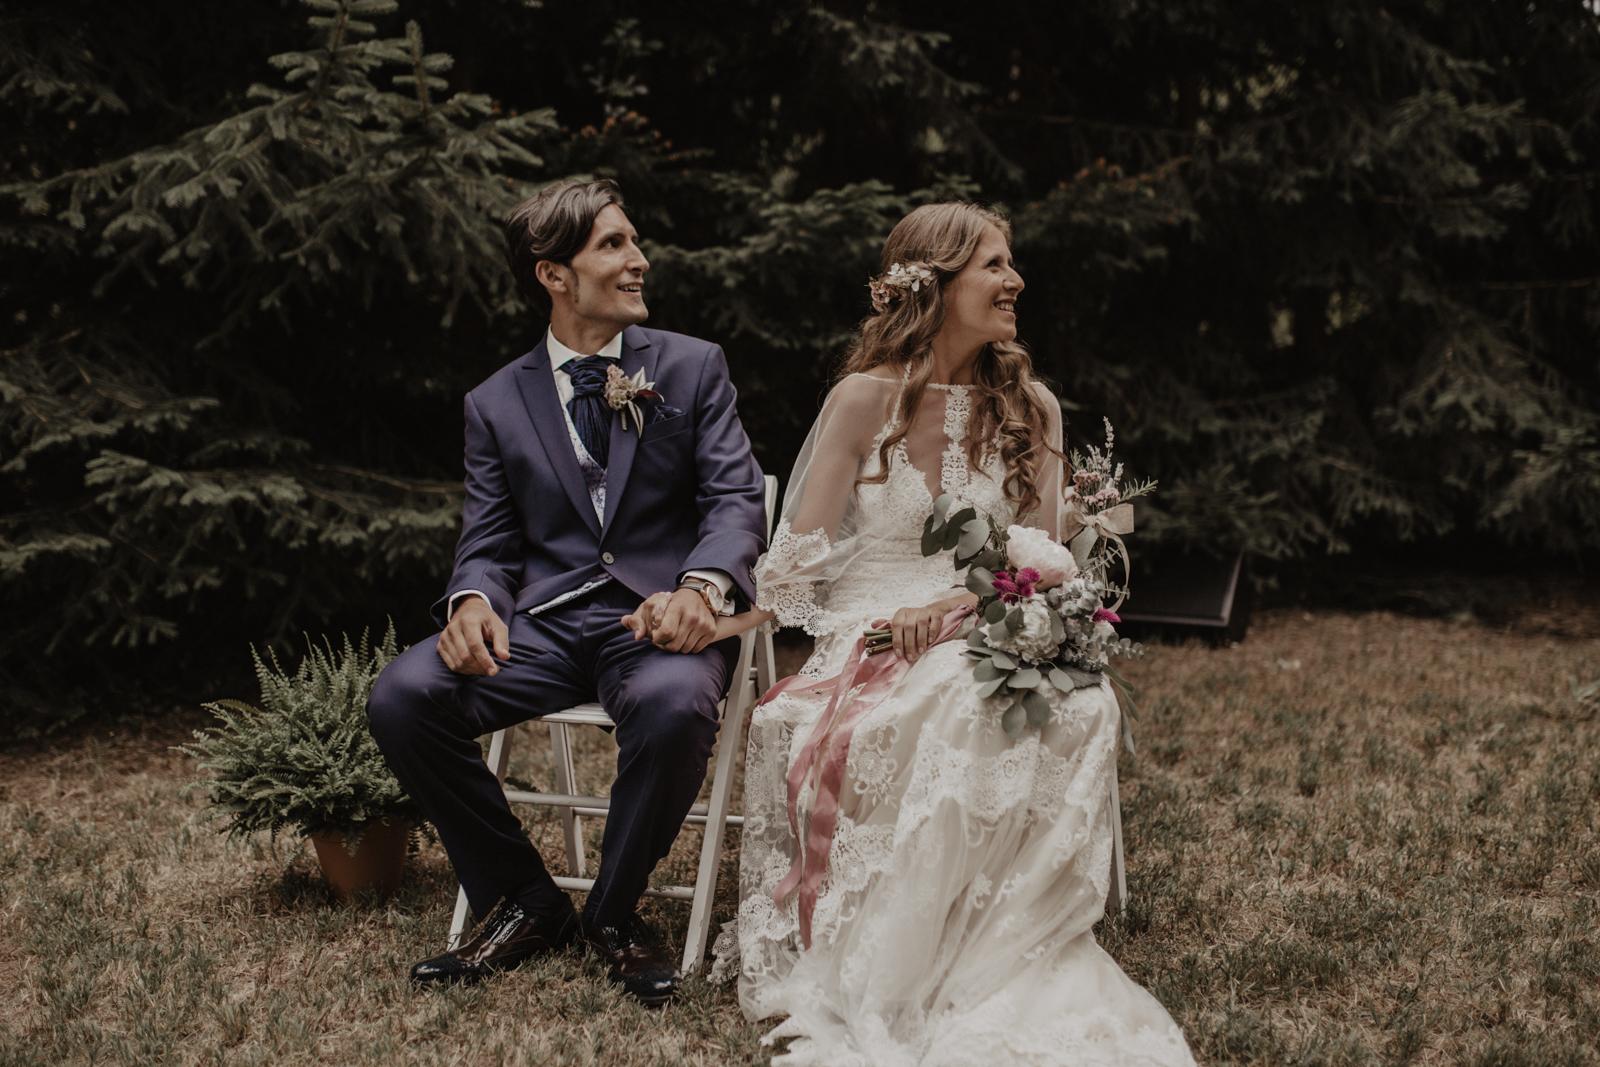 thenortherngirlphotography_photography_thenortherngirl_rebeccascabros_wedding_weddingphotography_weddingphotographer_barcelona_bodaenbarcelona_bodaenmaselmarti_bodarogeryvane-383.jpg